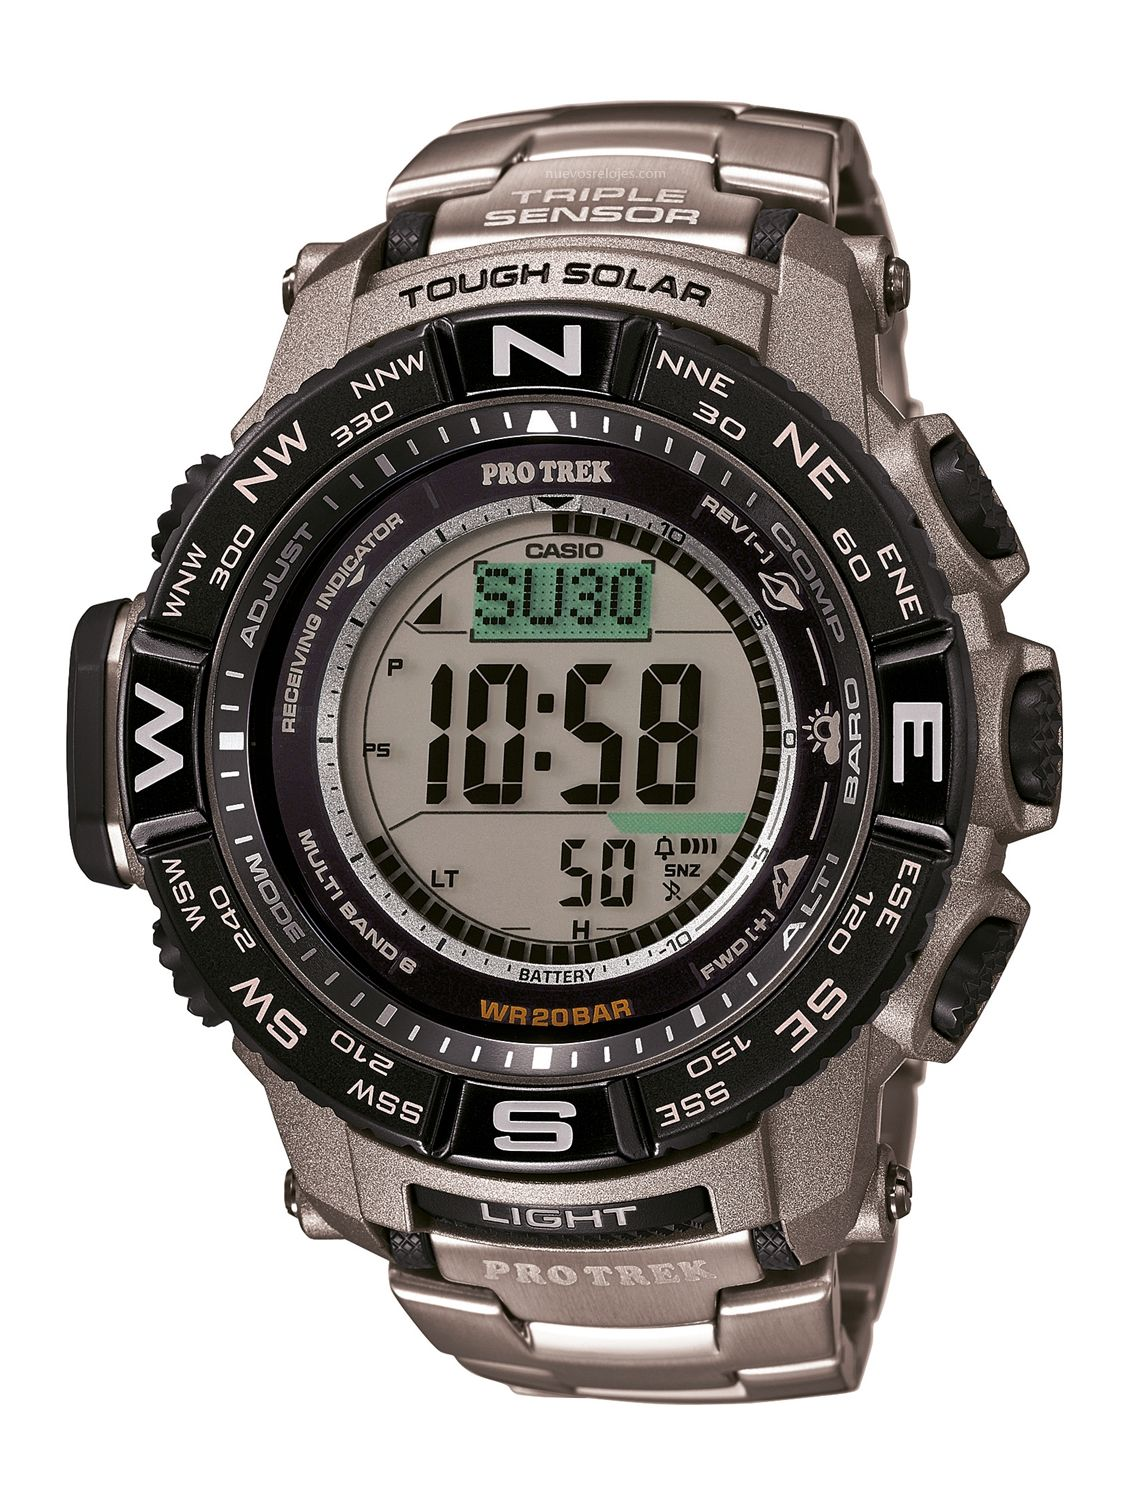 647a0d4912f4 CASIO PRO TREK PRW-3500t-7ER Relojes Deportivos Hombre